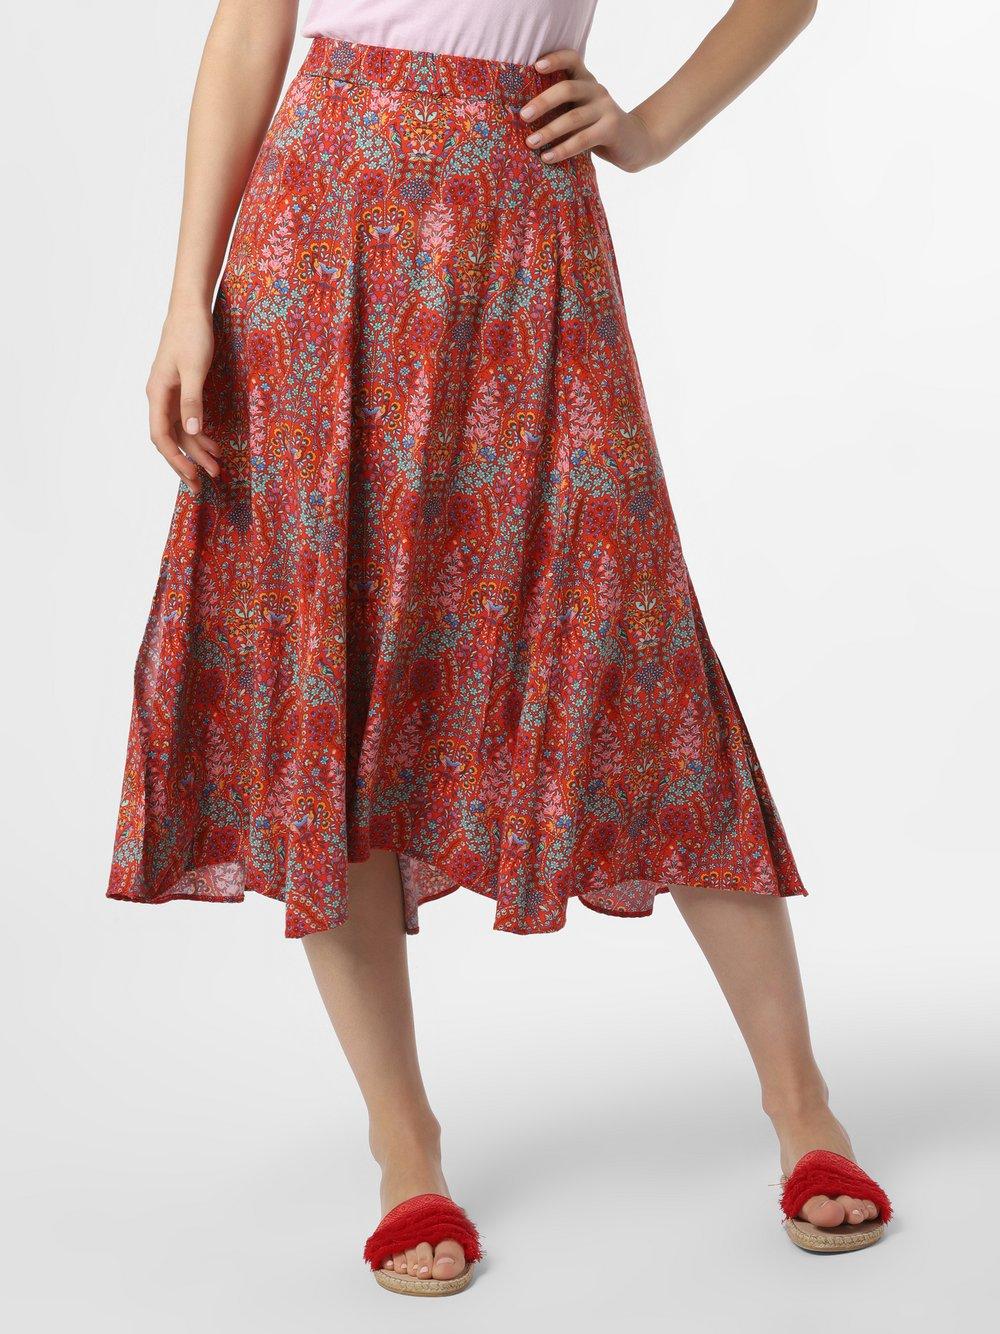 0039 Italy – Spódnica damska – Fili, pomarańczowy Van Graaf 464279-0001